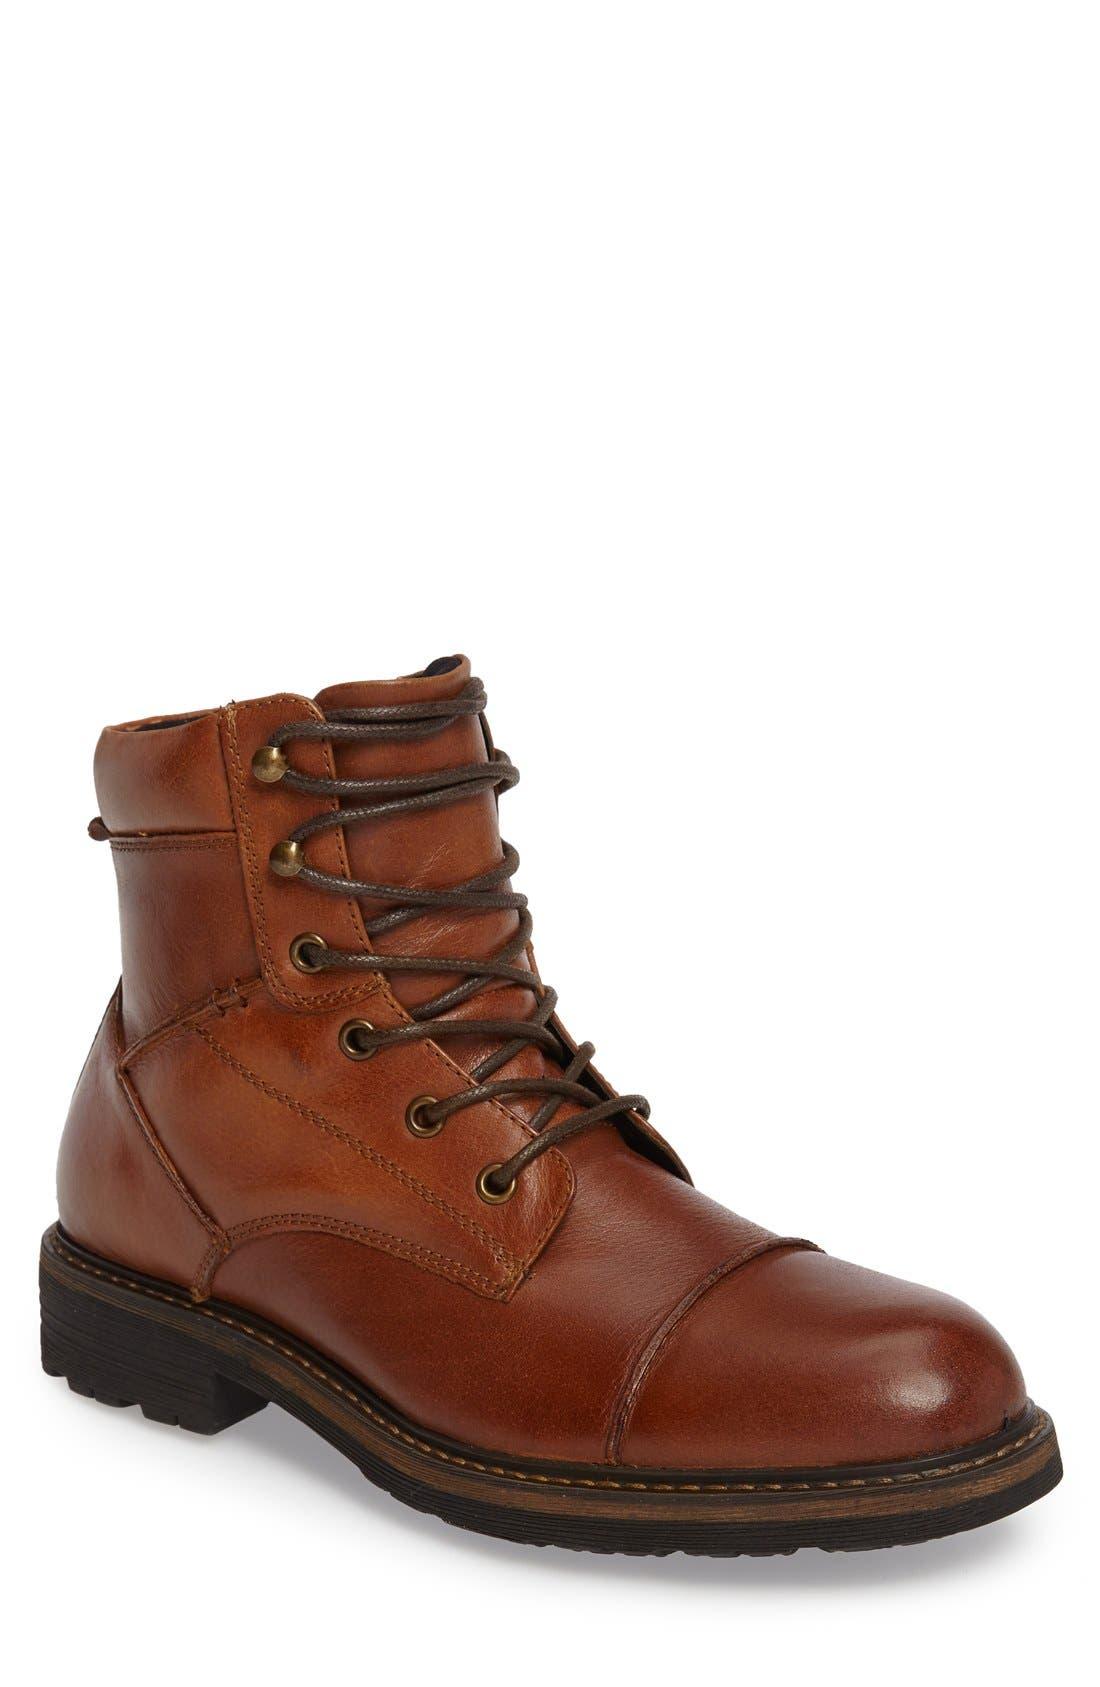 Derek Cap Toe Boot,                         Main,                         color, COGNAC LEATHER